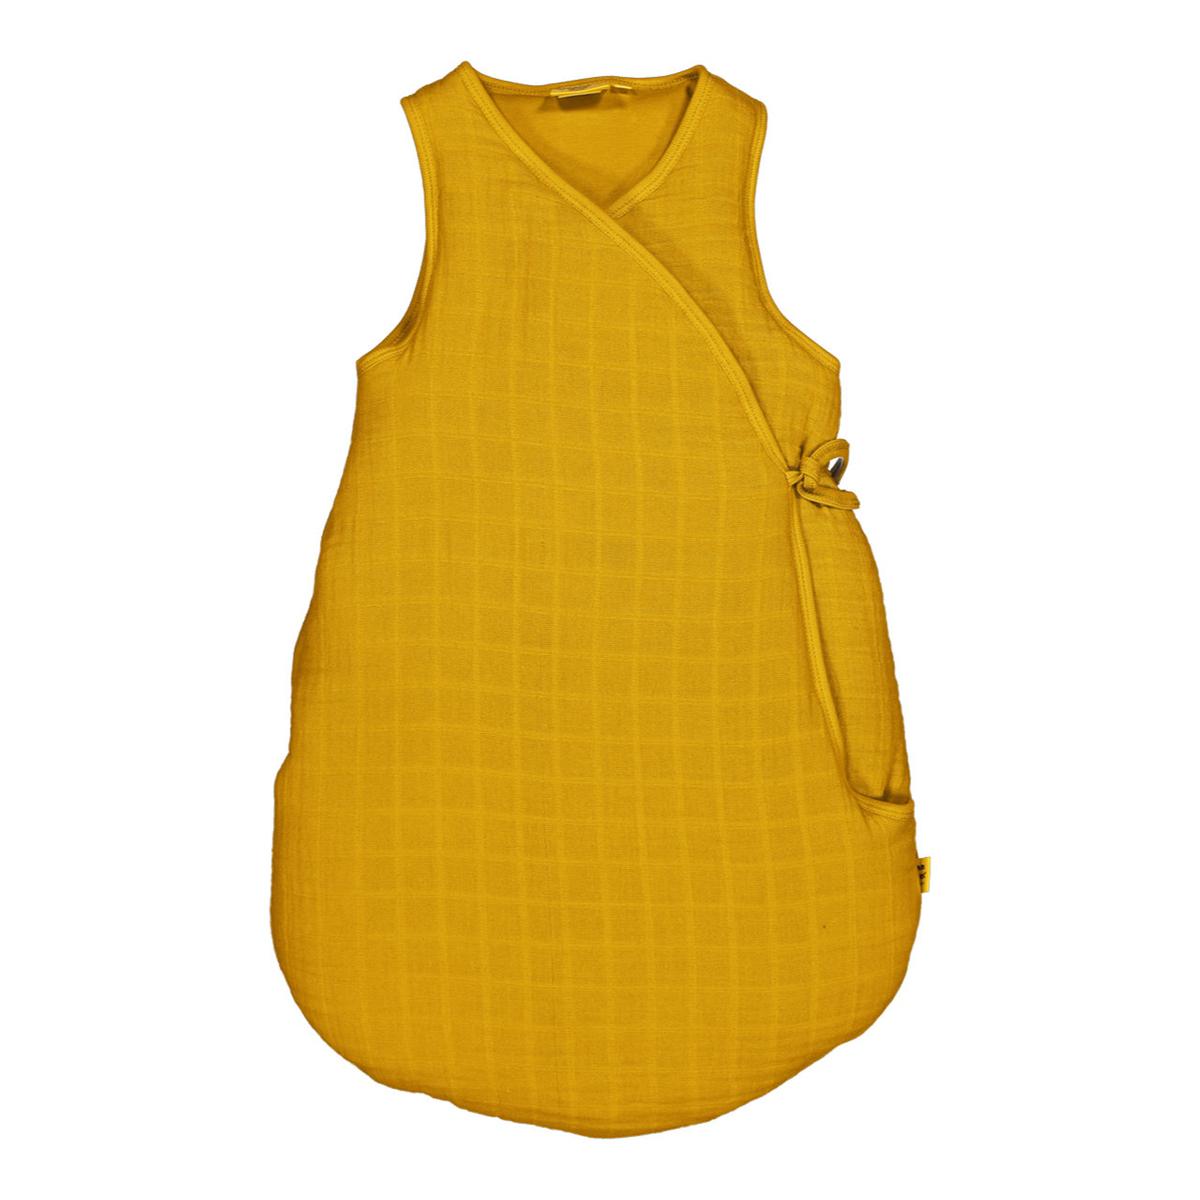 Gigoteuse Gigoteuse Sleepy Mustard - 6/12 Mois Gigoteuse Sleepy Mustard - 6/12 Mois